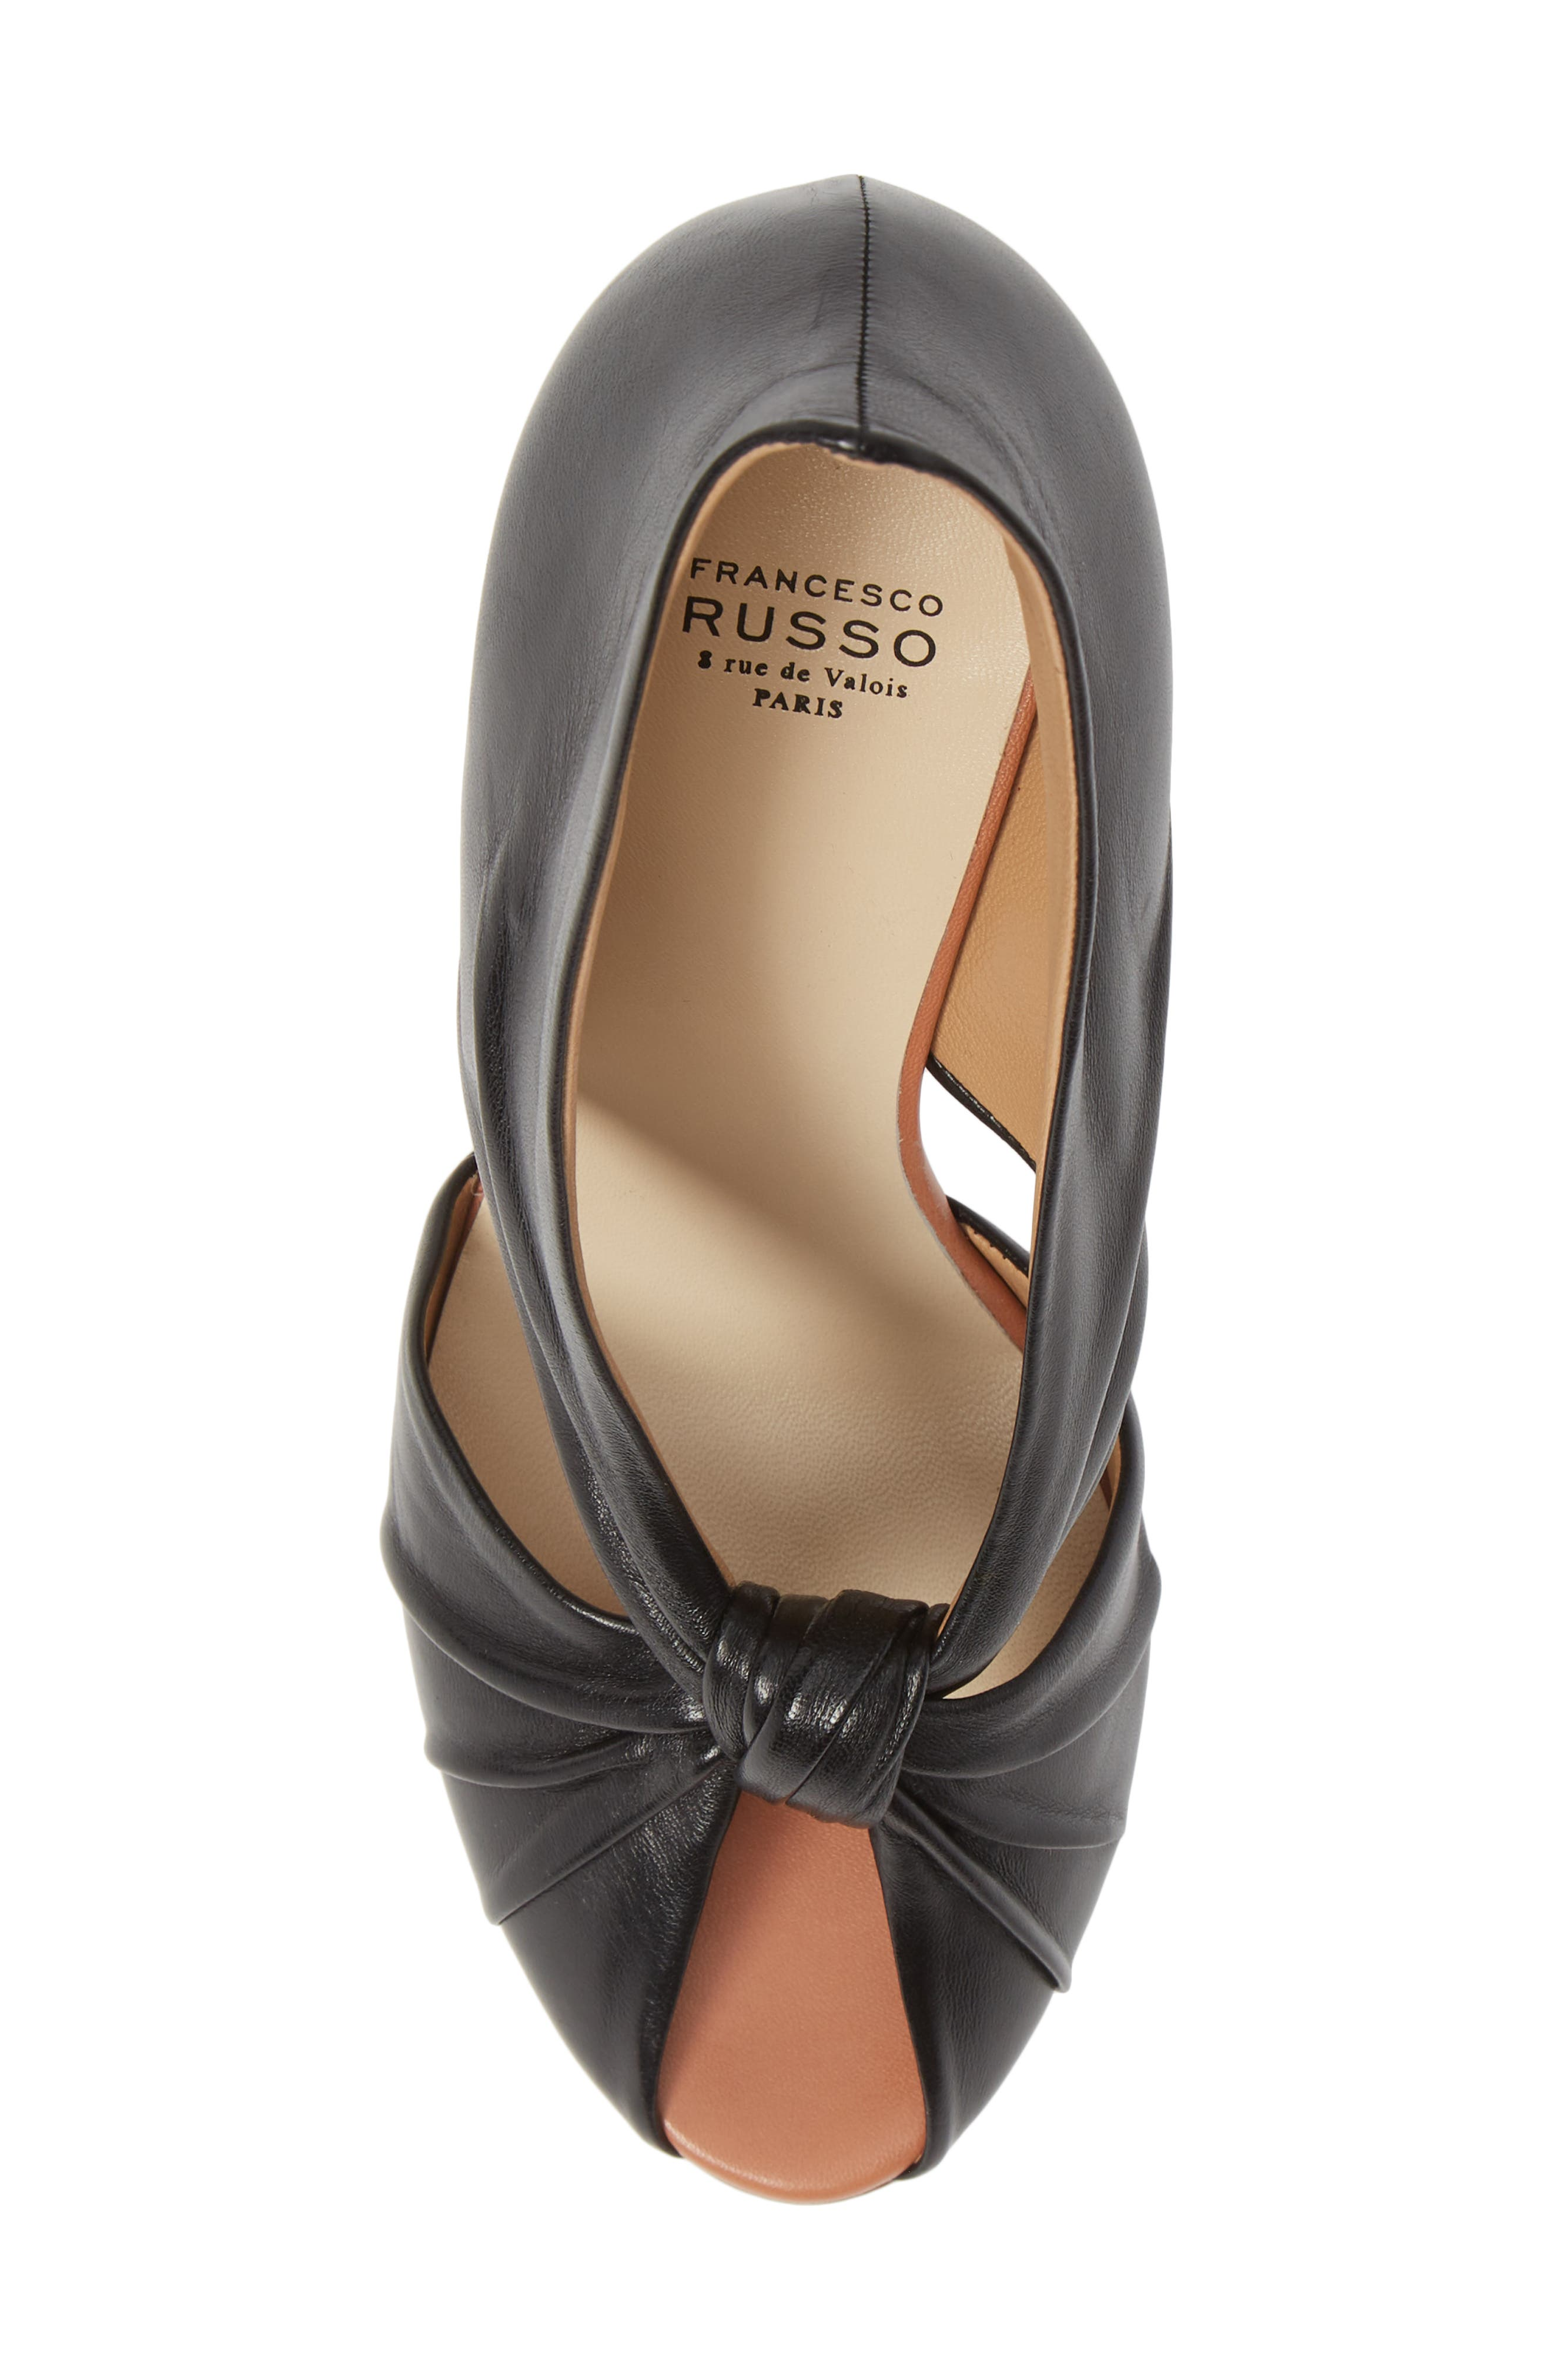 FRANCESCO RUSSO, Knotted Peep Toe Pump, Alternate thumbnail 5, color, BLACK